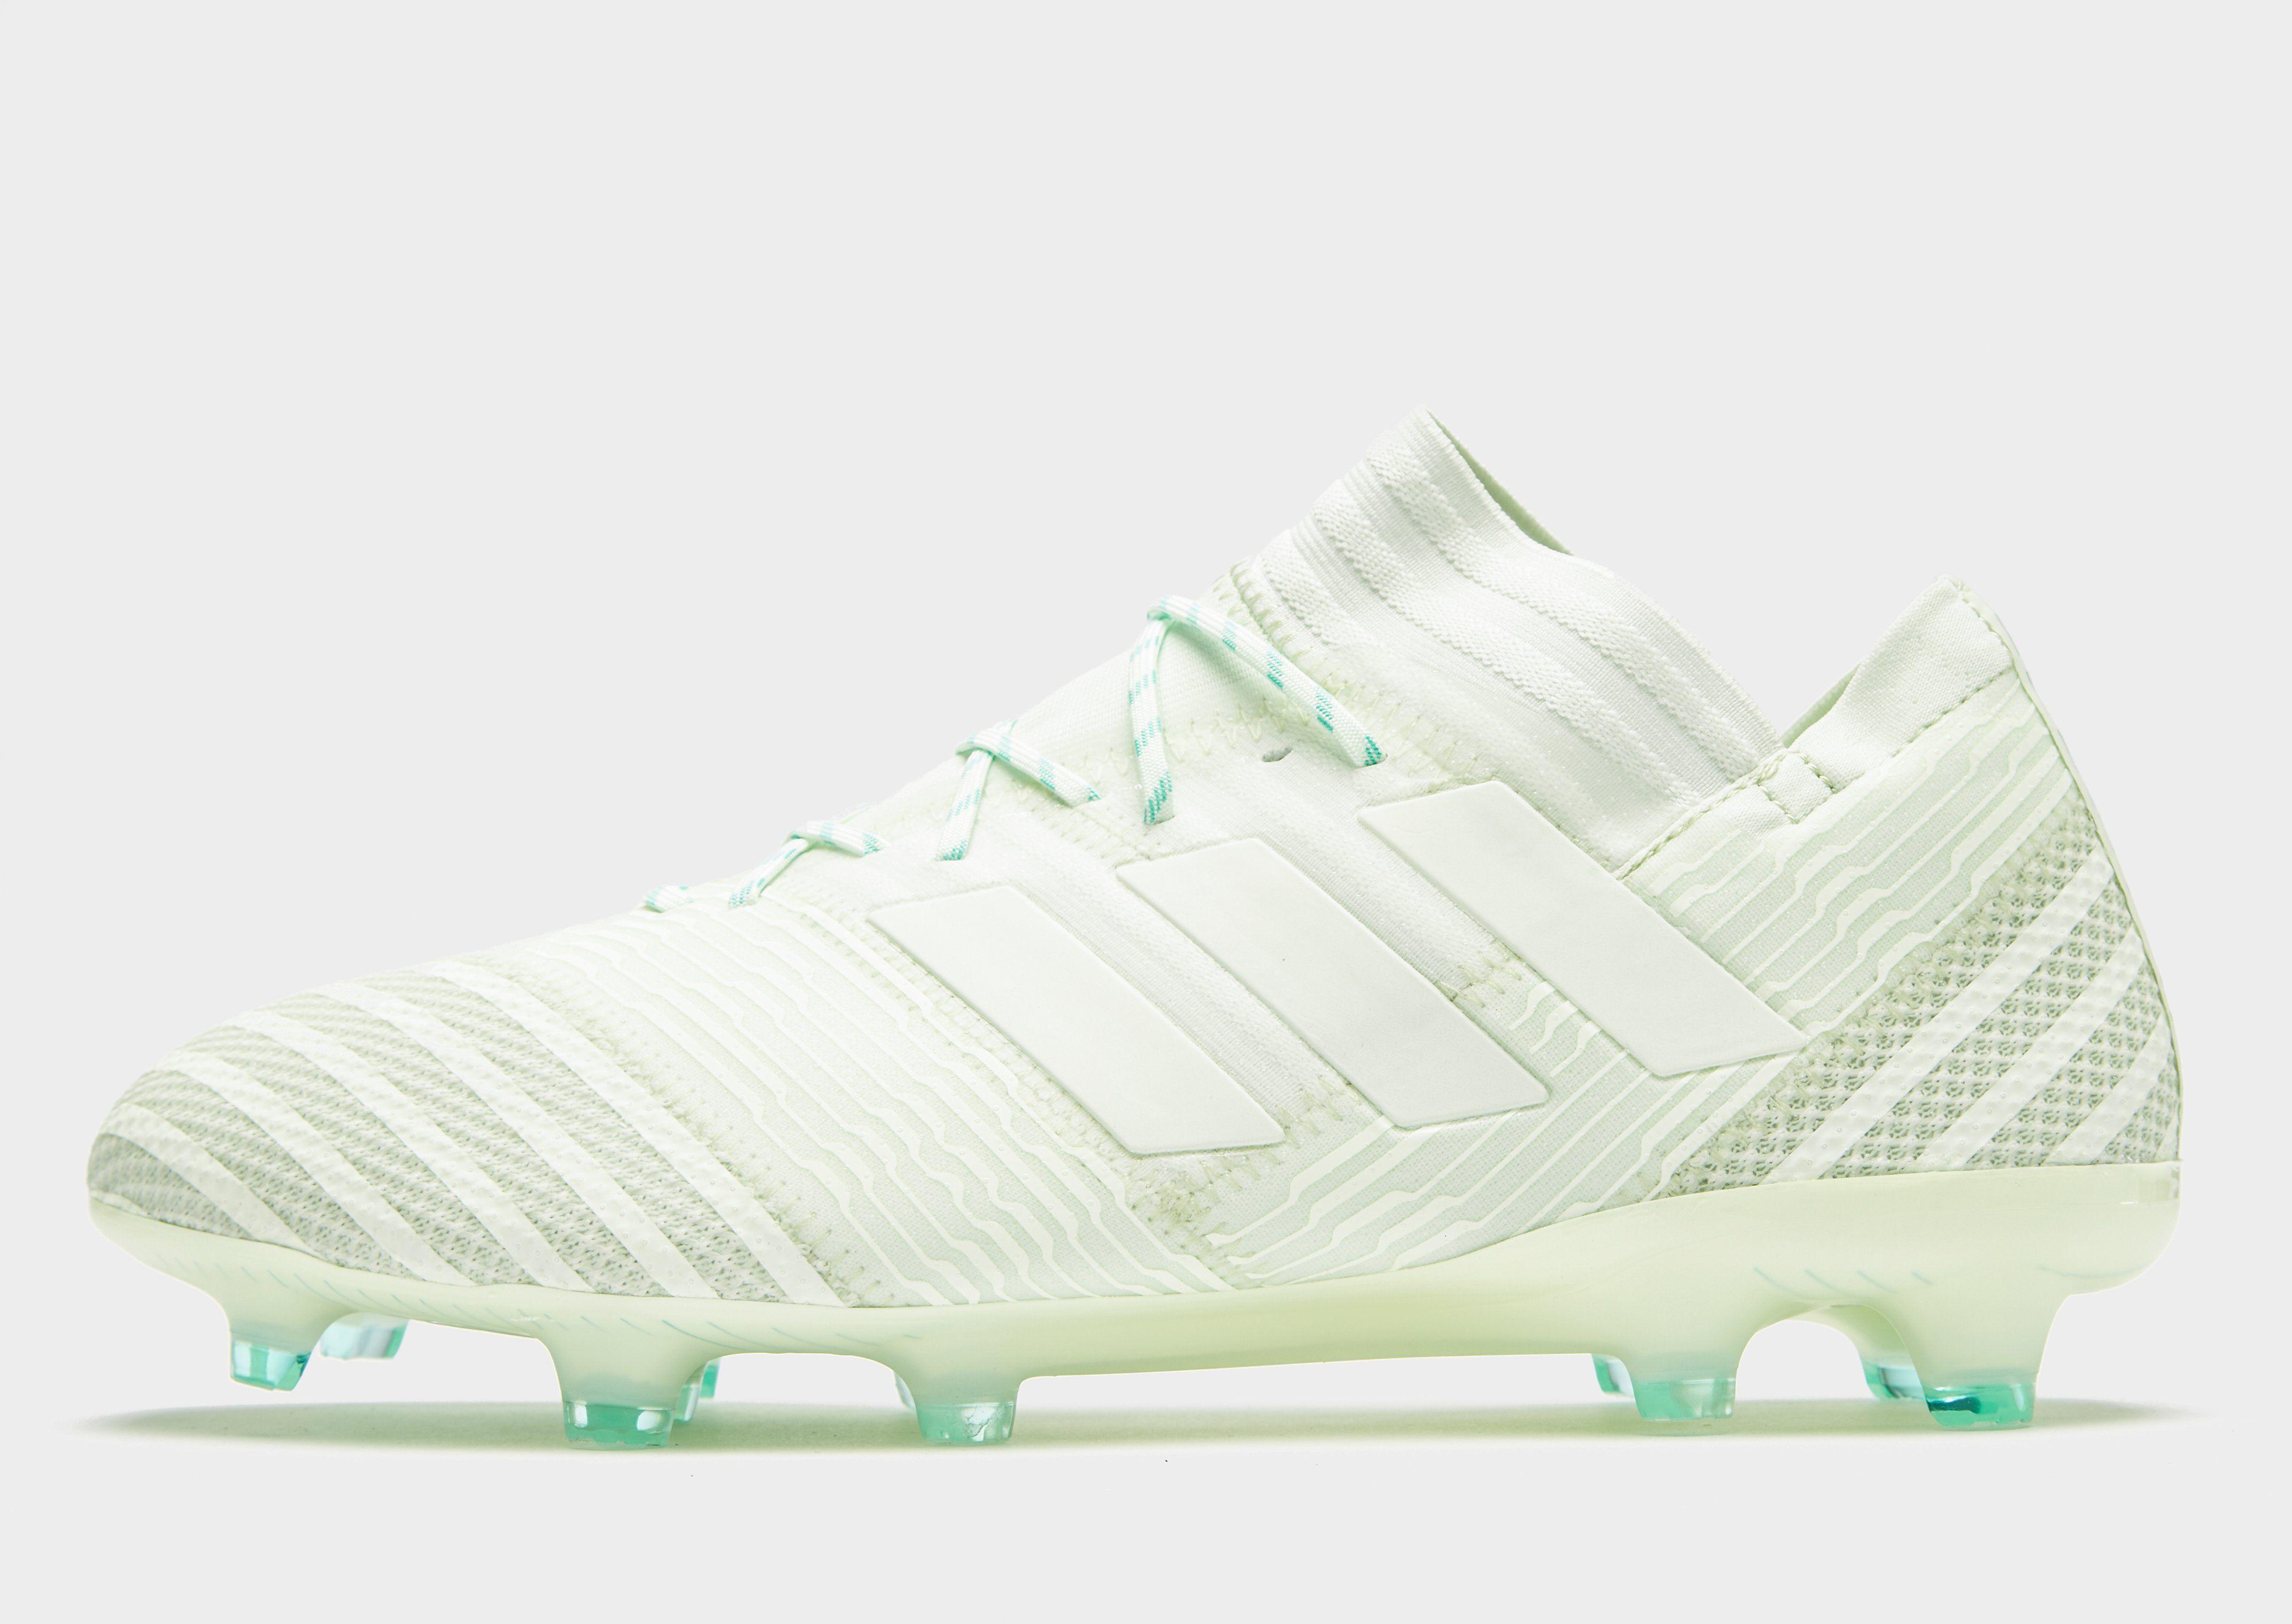 0ad03dcc4 adidas Deadly Strike Nemeziz 17.1 FG